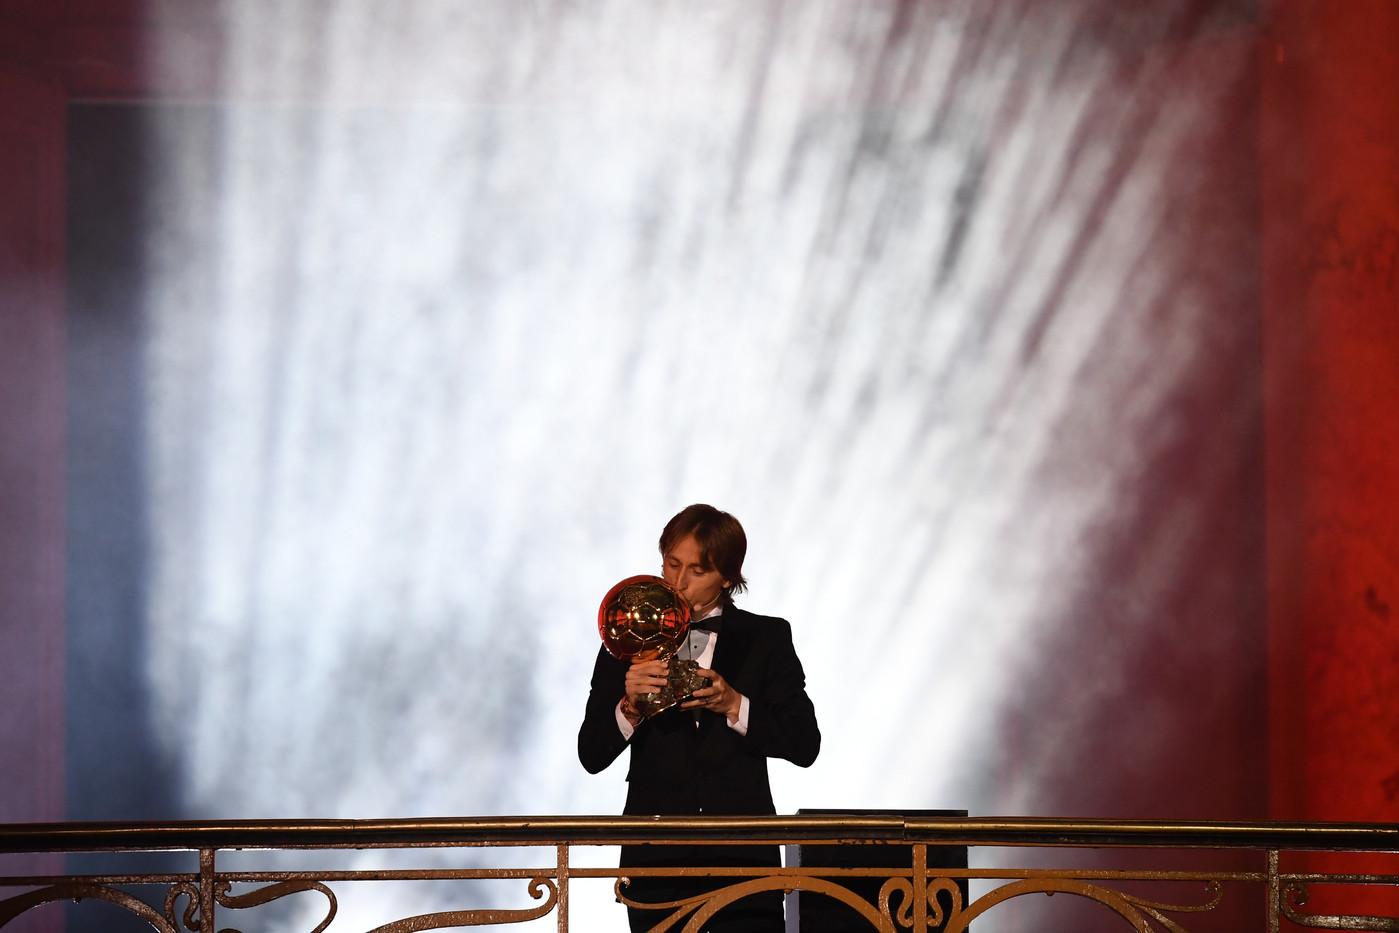 Luka Modric lifts 2018 Ballon d'Or against Messi or Ronaldo